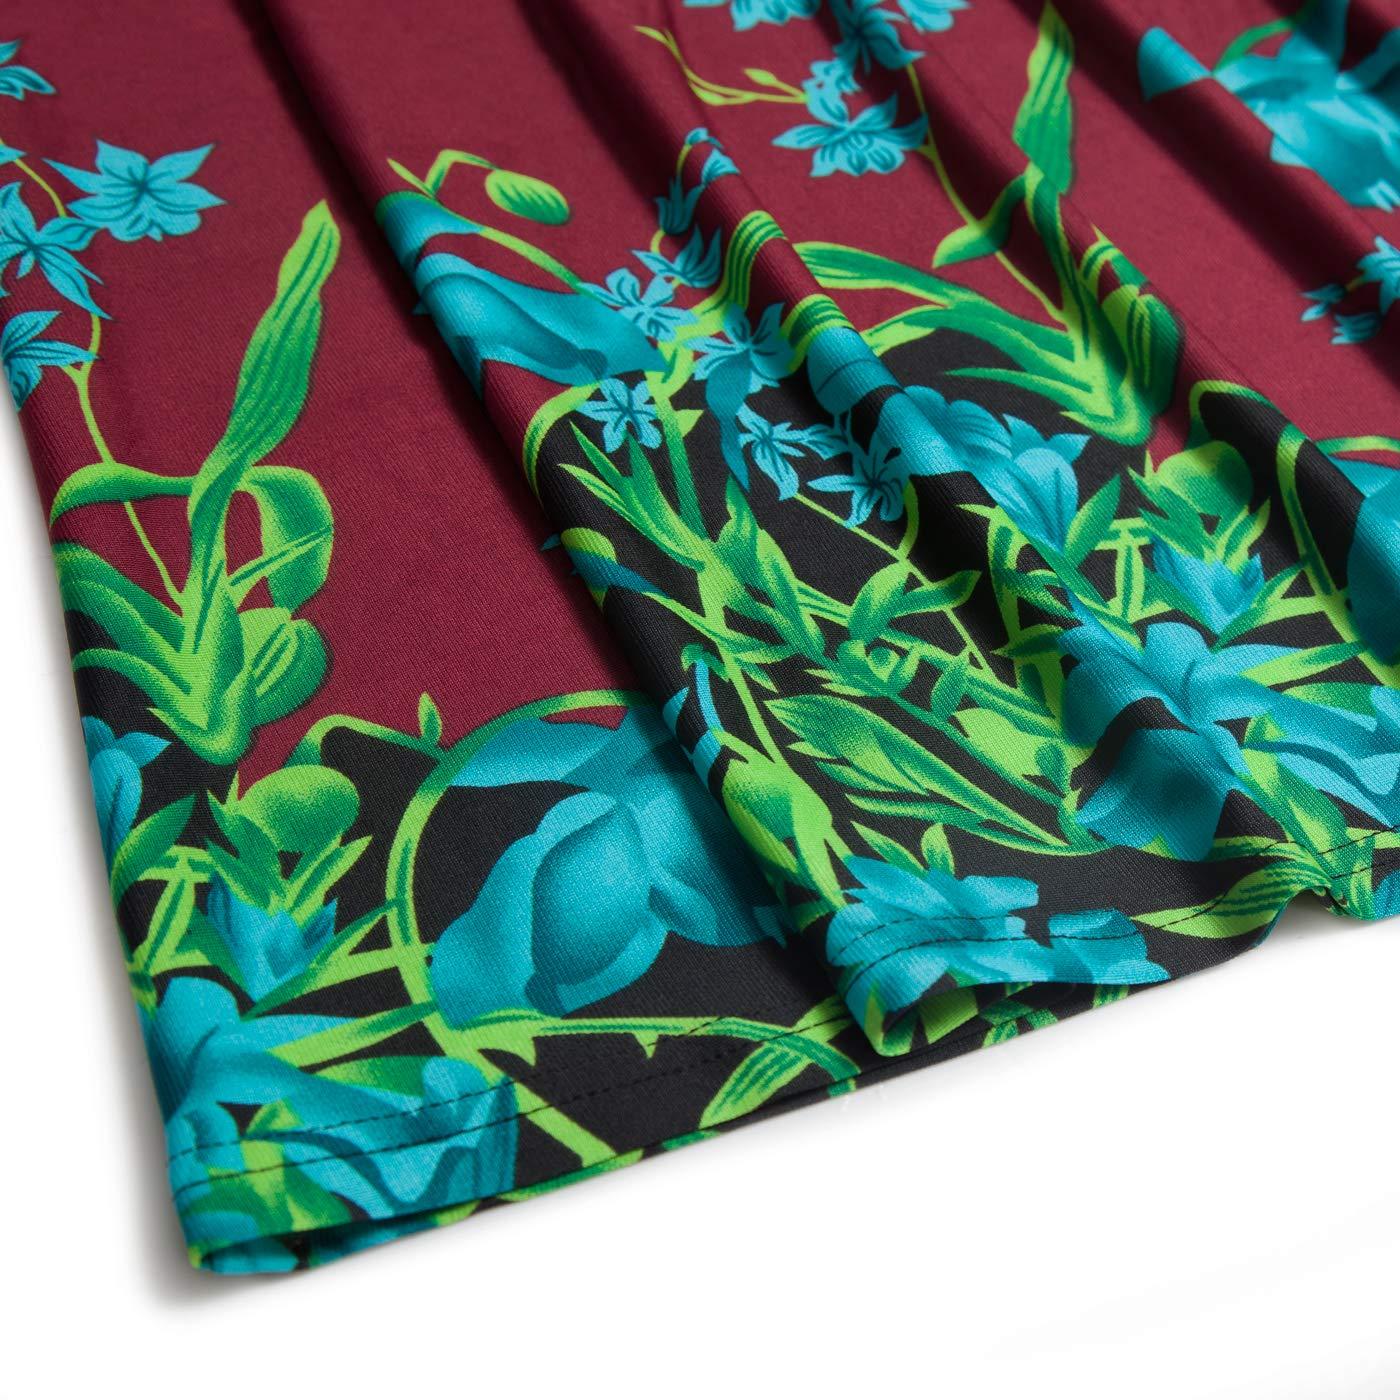 b5c33a7b29d1e2 Women Nandashe Women 3/4 Sleeve Floral Tunic Tops V Neck Loose Blouse  Button up Shirt